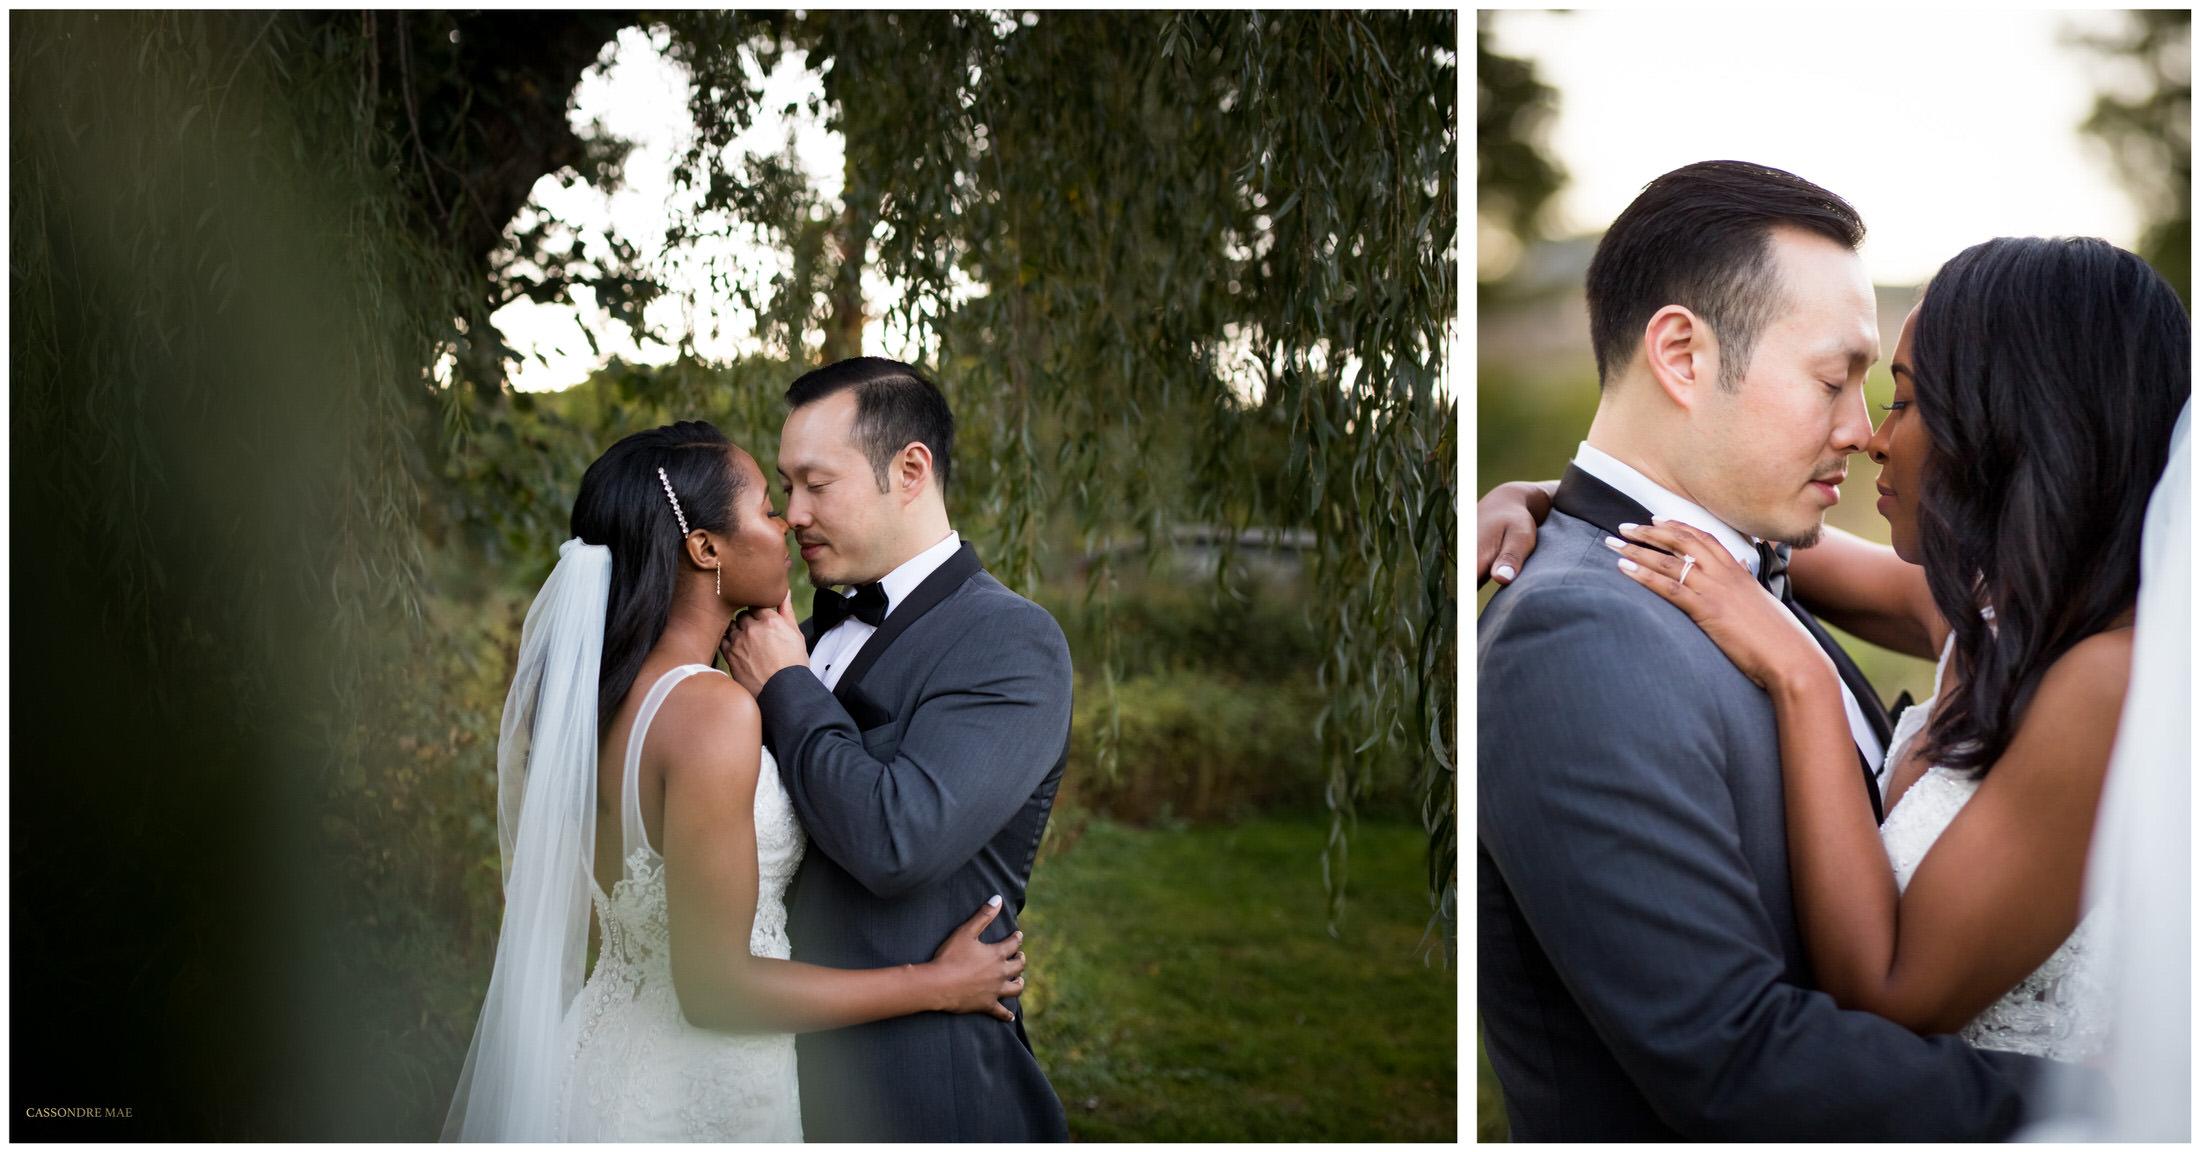 West Hills Country Club Wedding Photos Cassondre Mae Photography 20.jpg